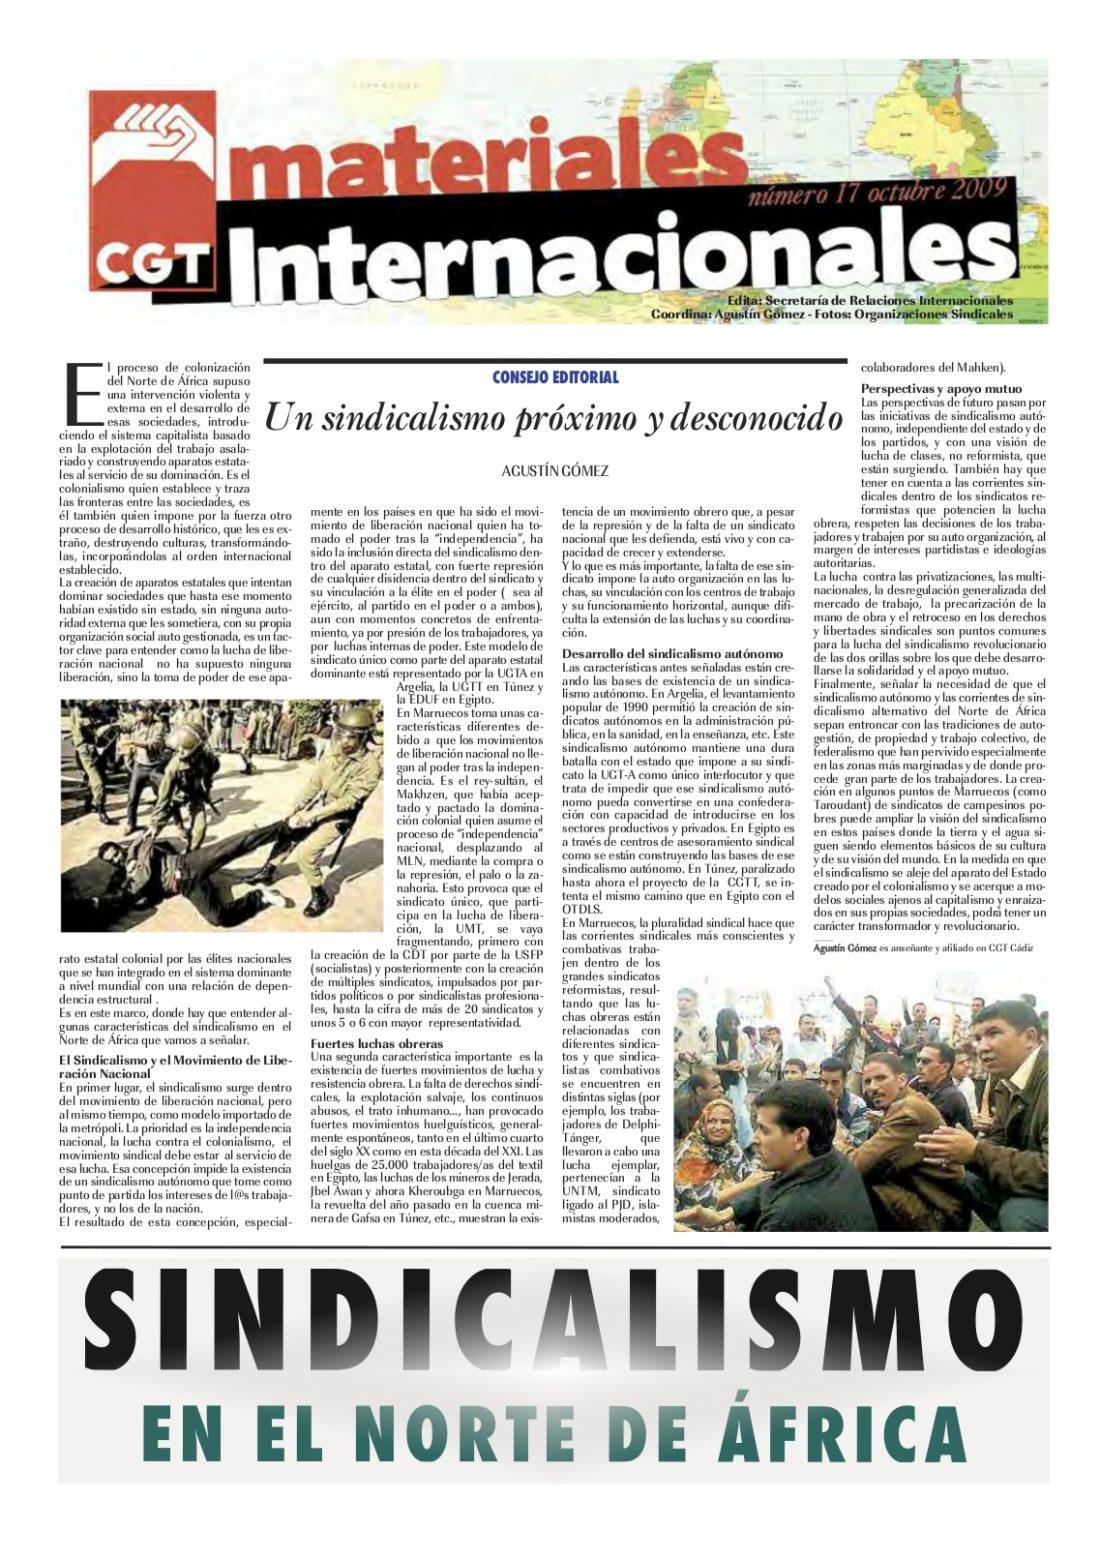 Nº 17. Materiales Internacionales. Octubre 2009